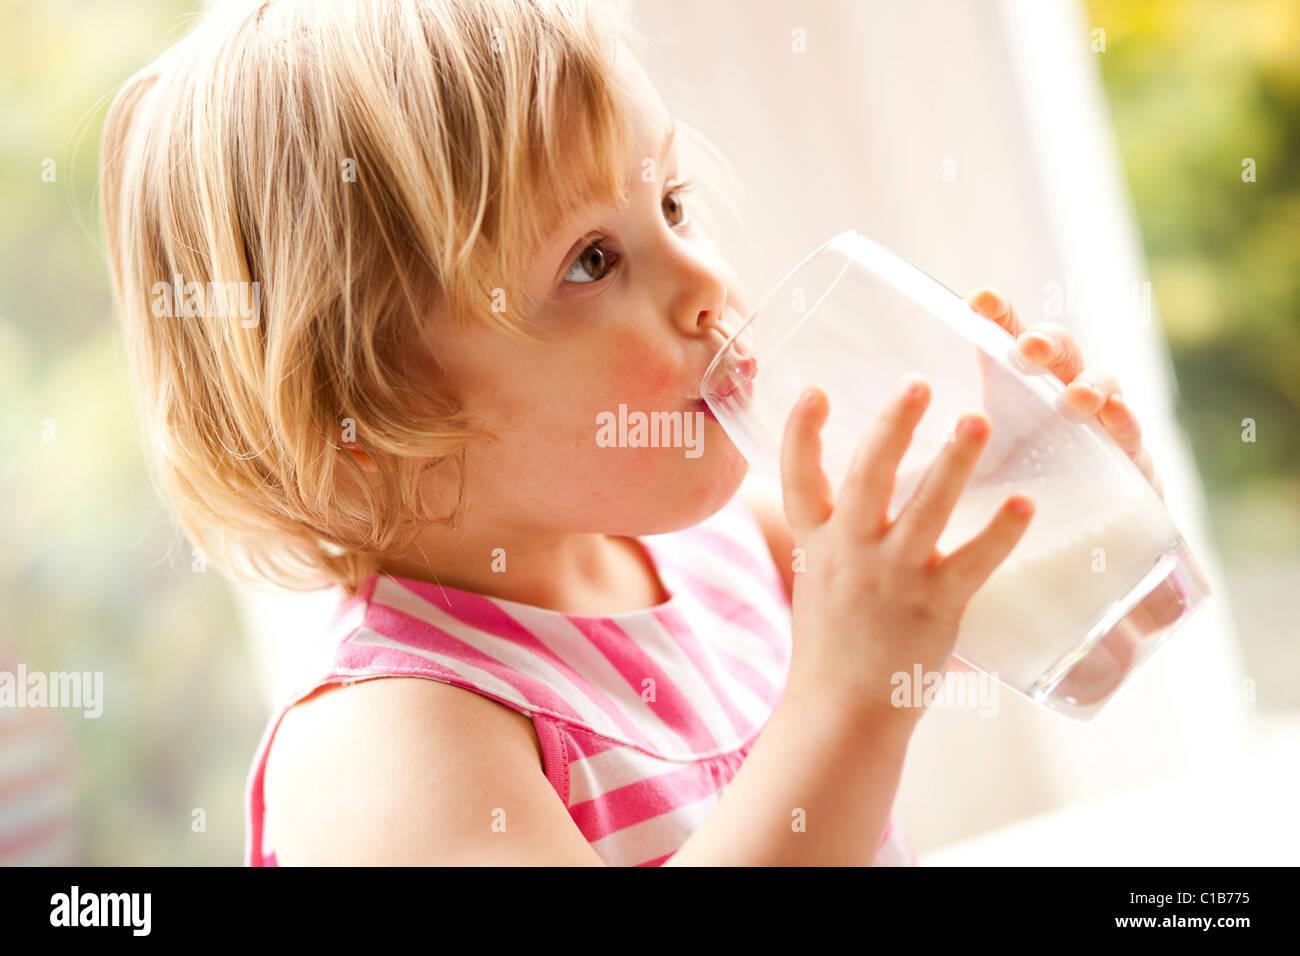 Niño beber un vaso de leche Imagen De Stock